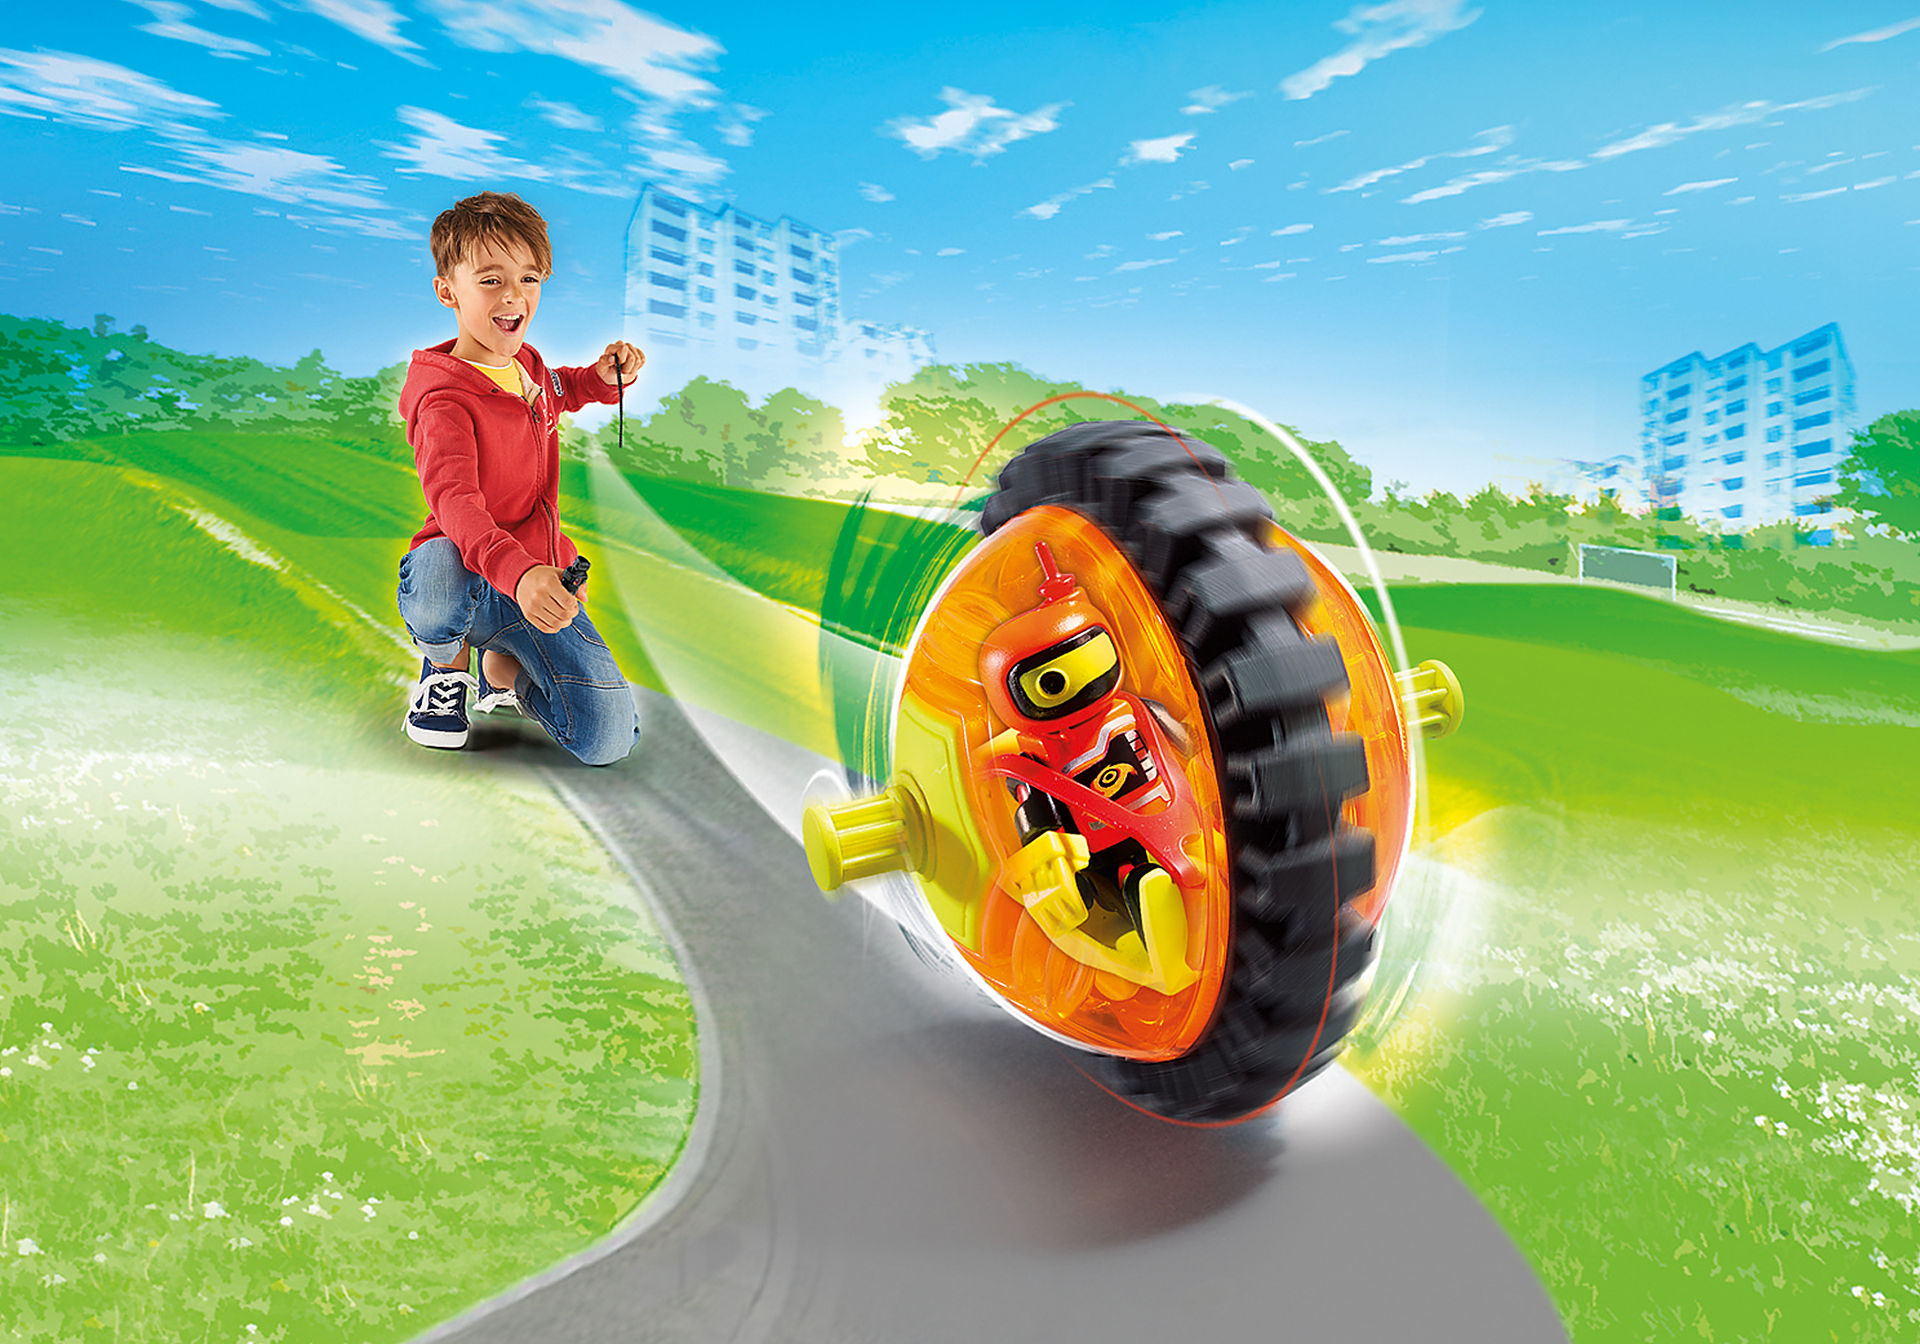 9203 Orange rollerracer zoom image1